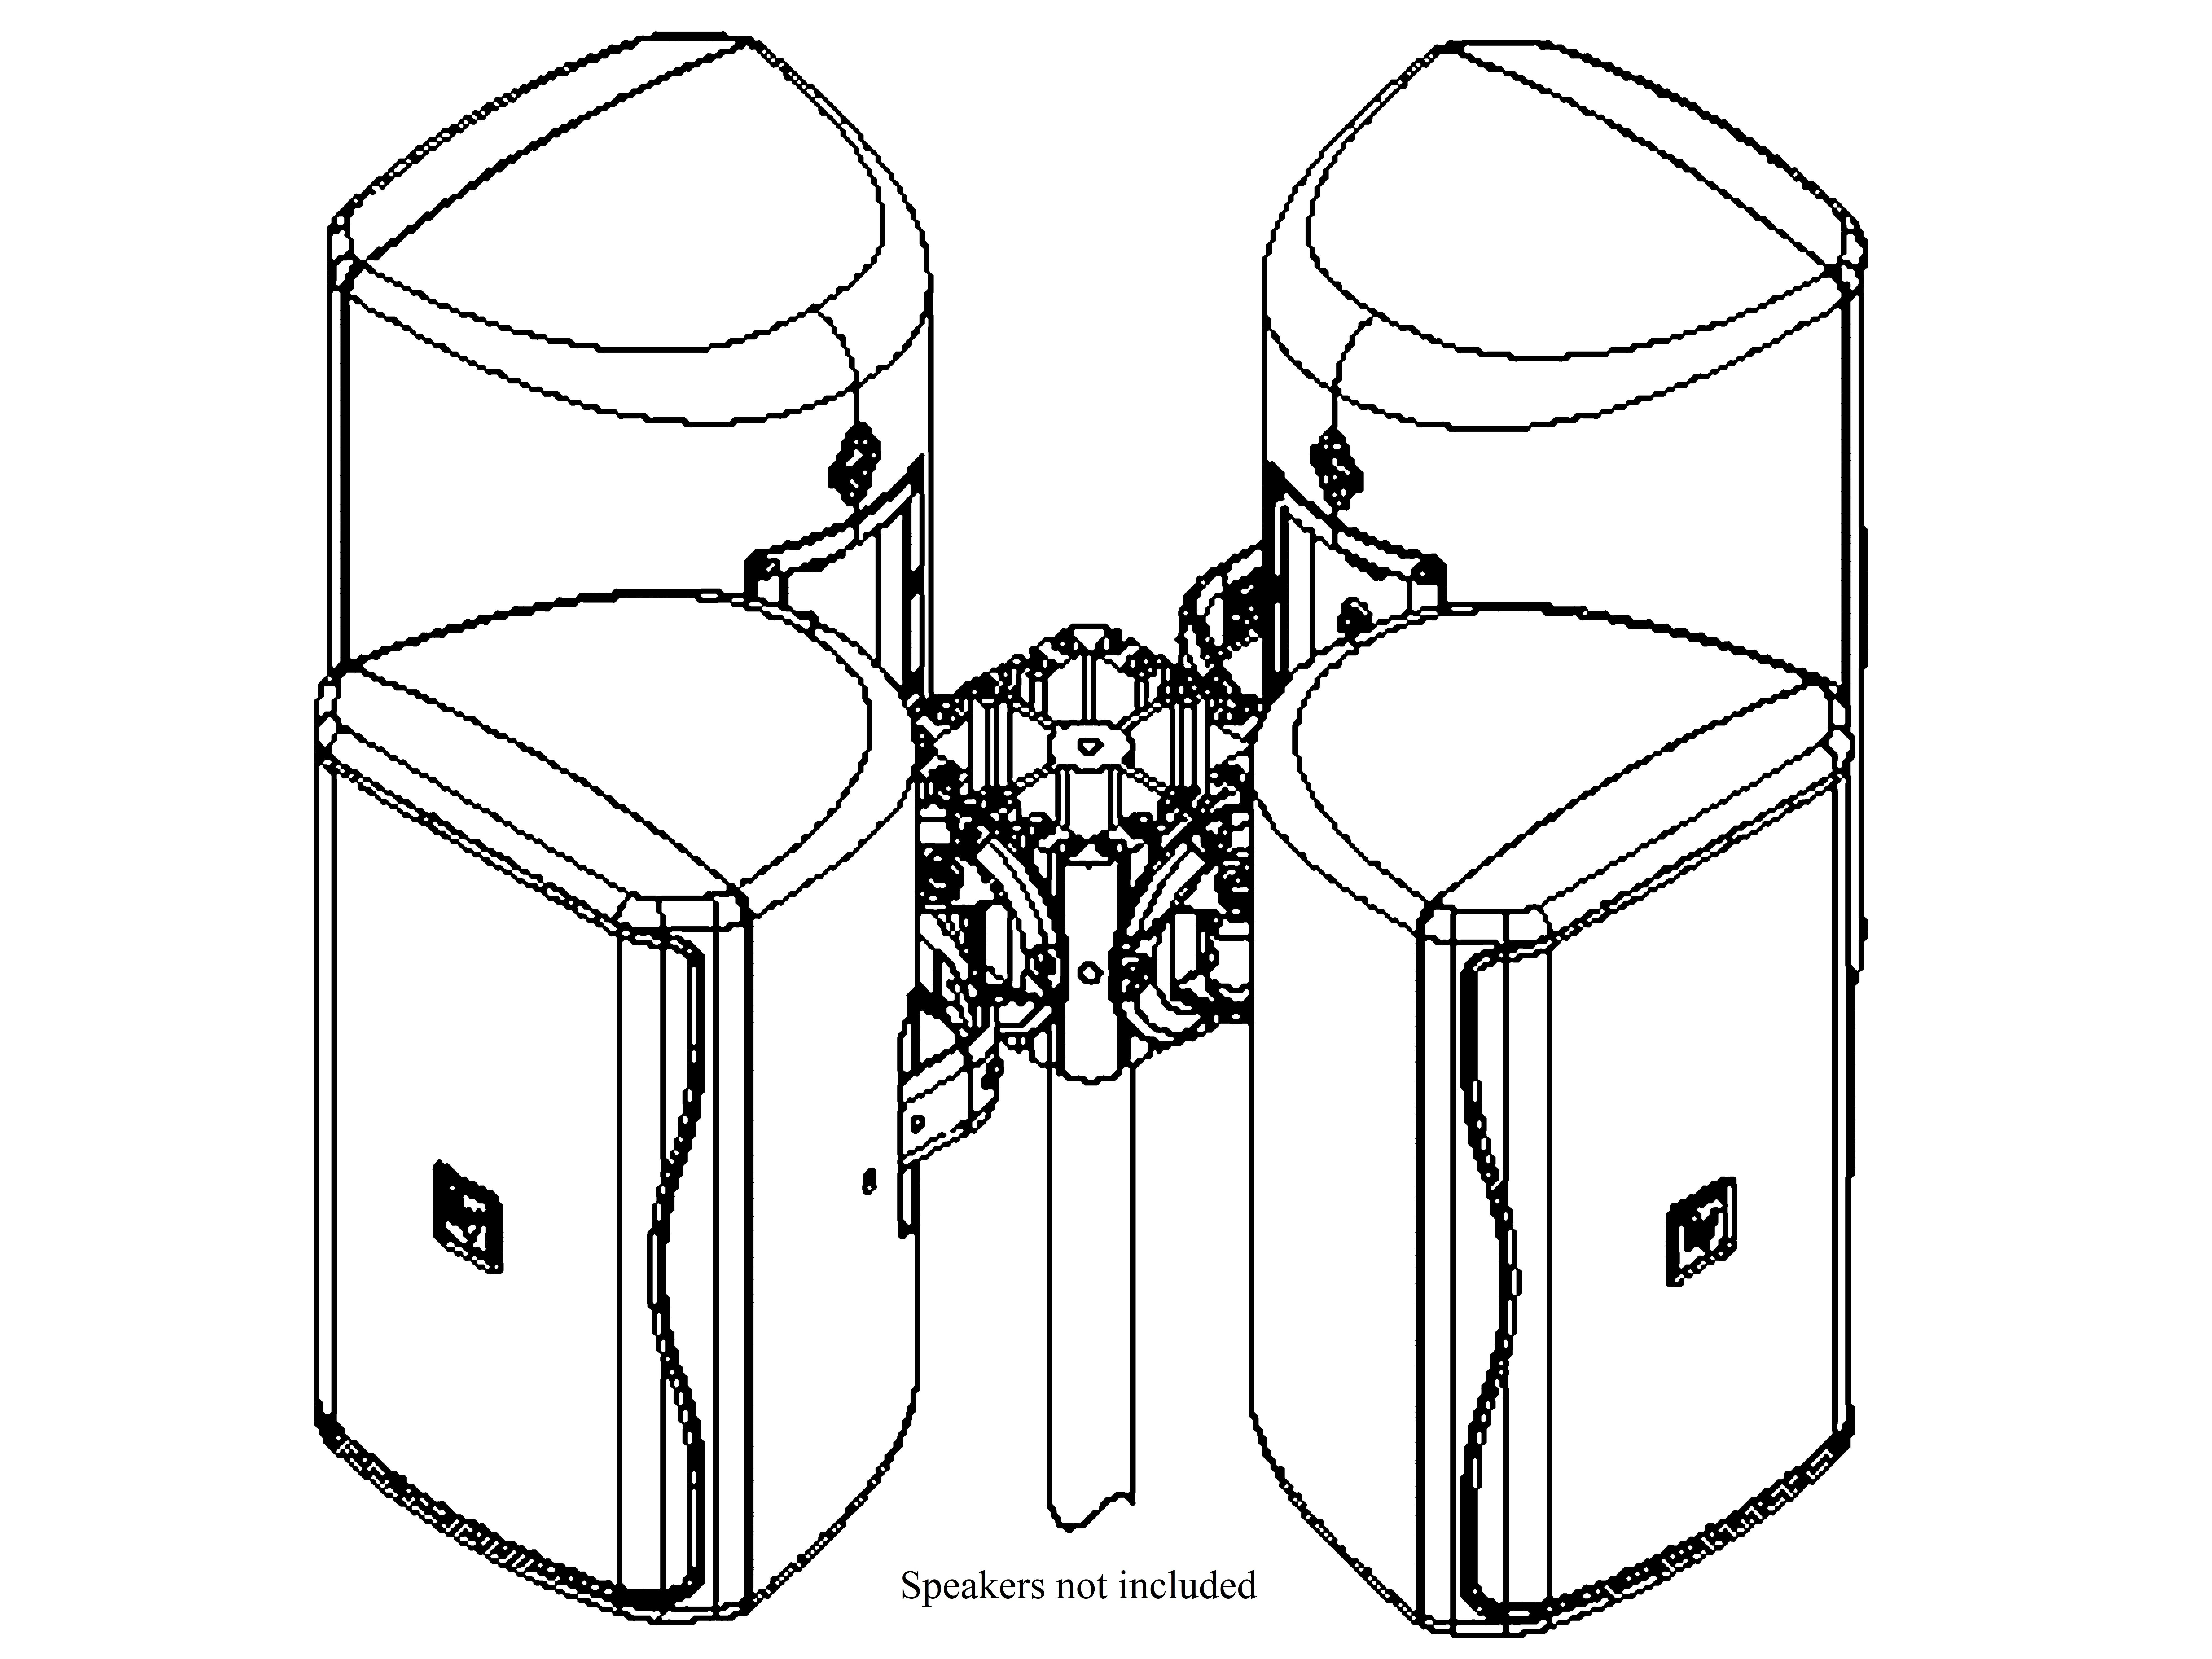 Electro-Voice ABZE Universal Array Bracket Mounting System